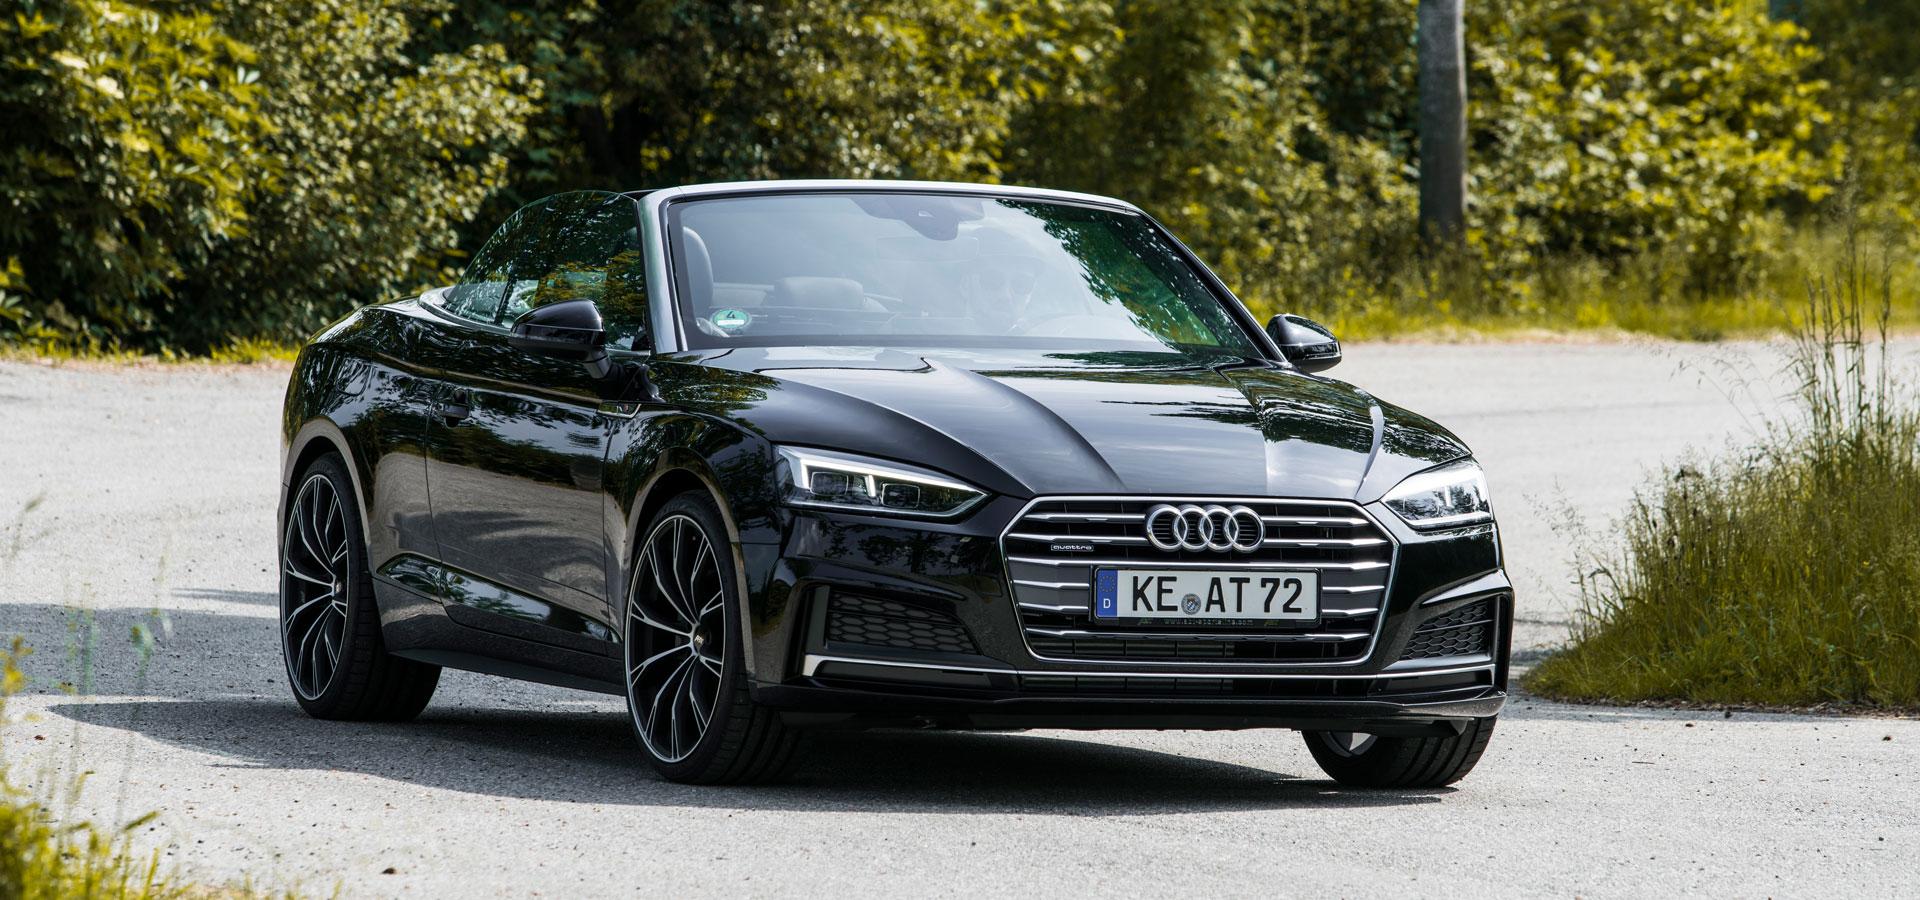 Coupè 5-Türer 2016 Kofferraumwanne für Audi A5 Sportback F5